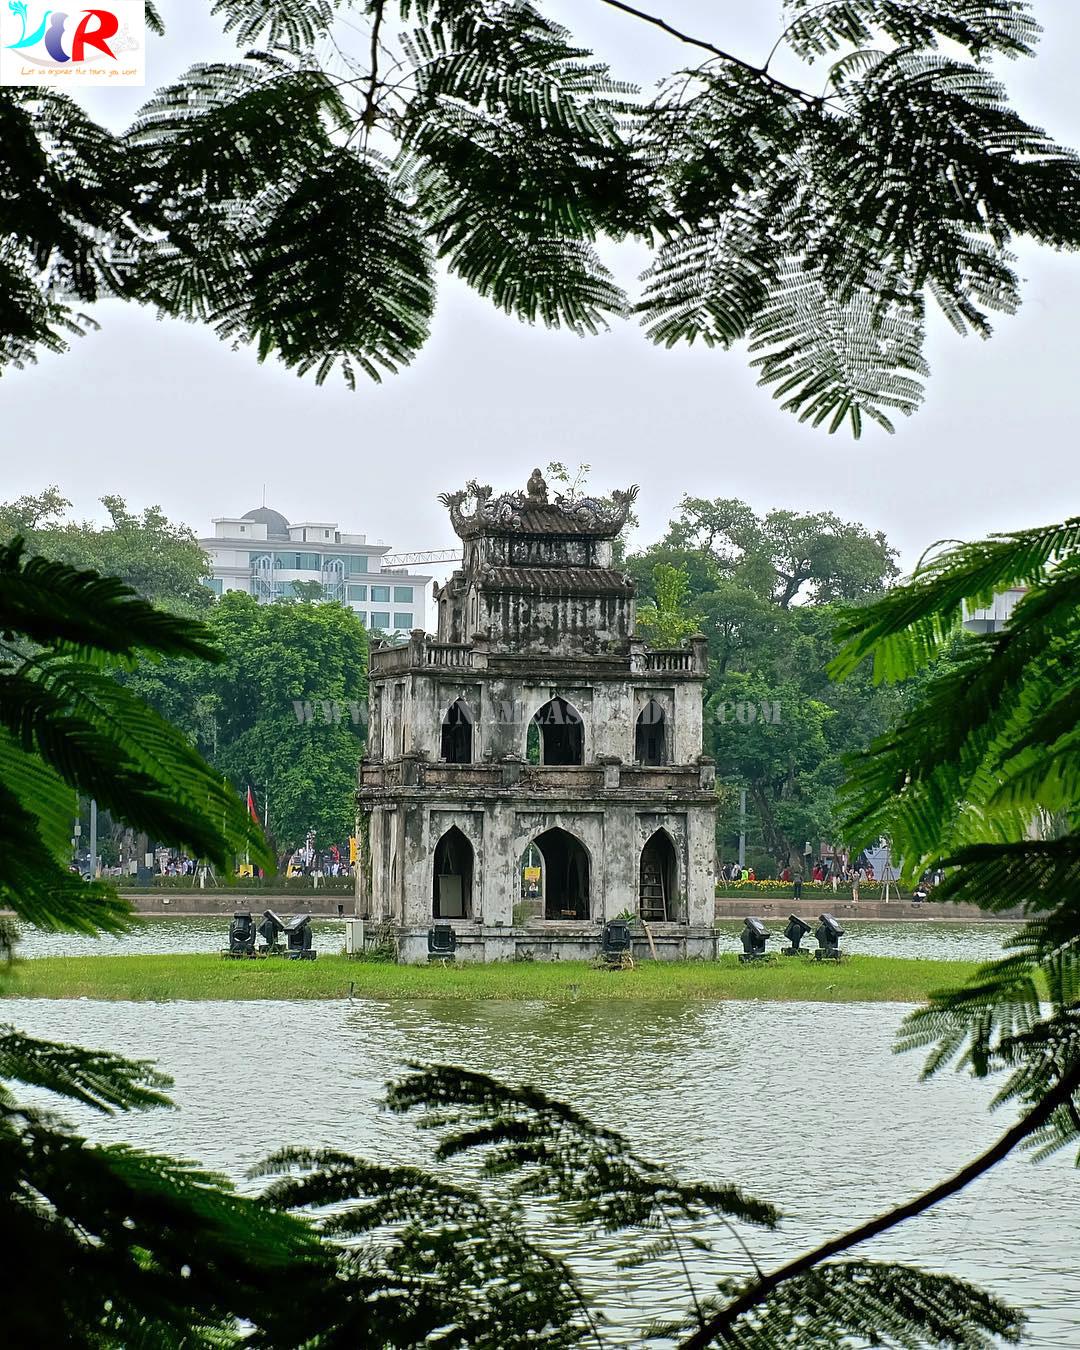 Hanoi - Historical and Beautiful Capital in Vietnam